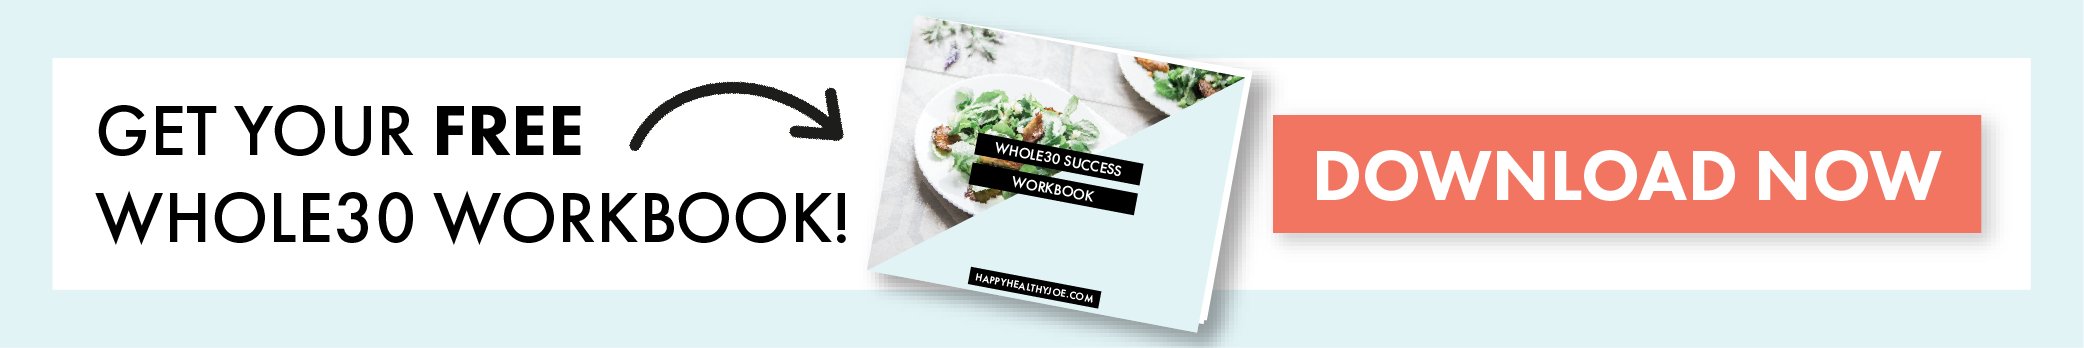 Get Your Whole30 Workbook | Whole30 | Happy Healthy Joe | Integrative Health Coach